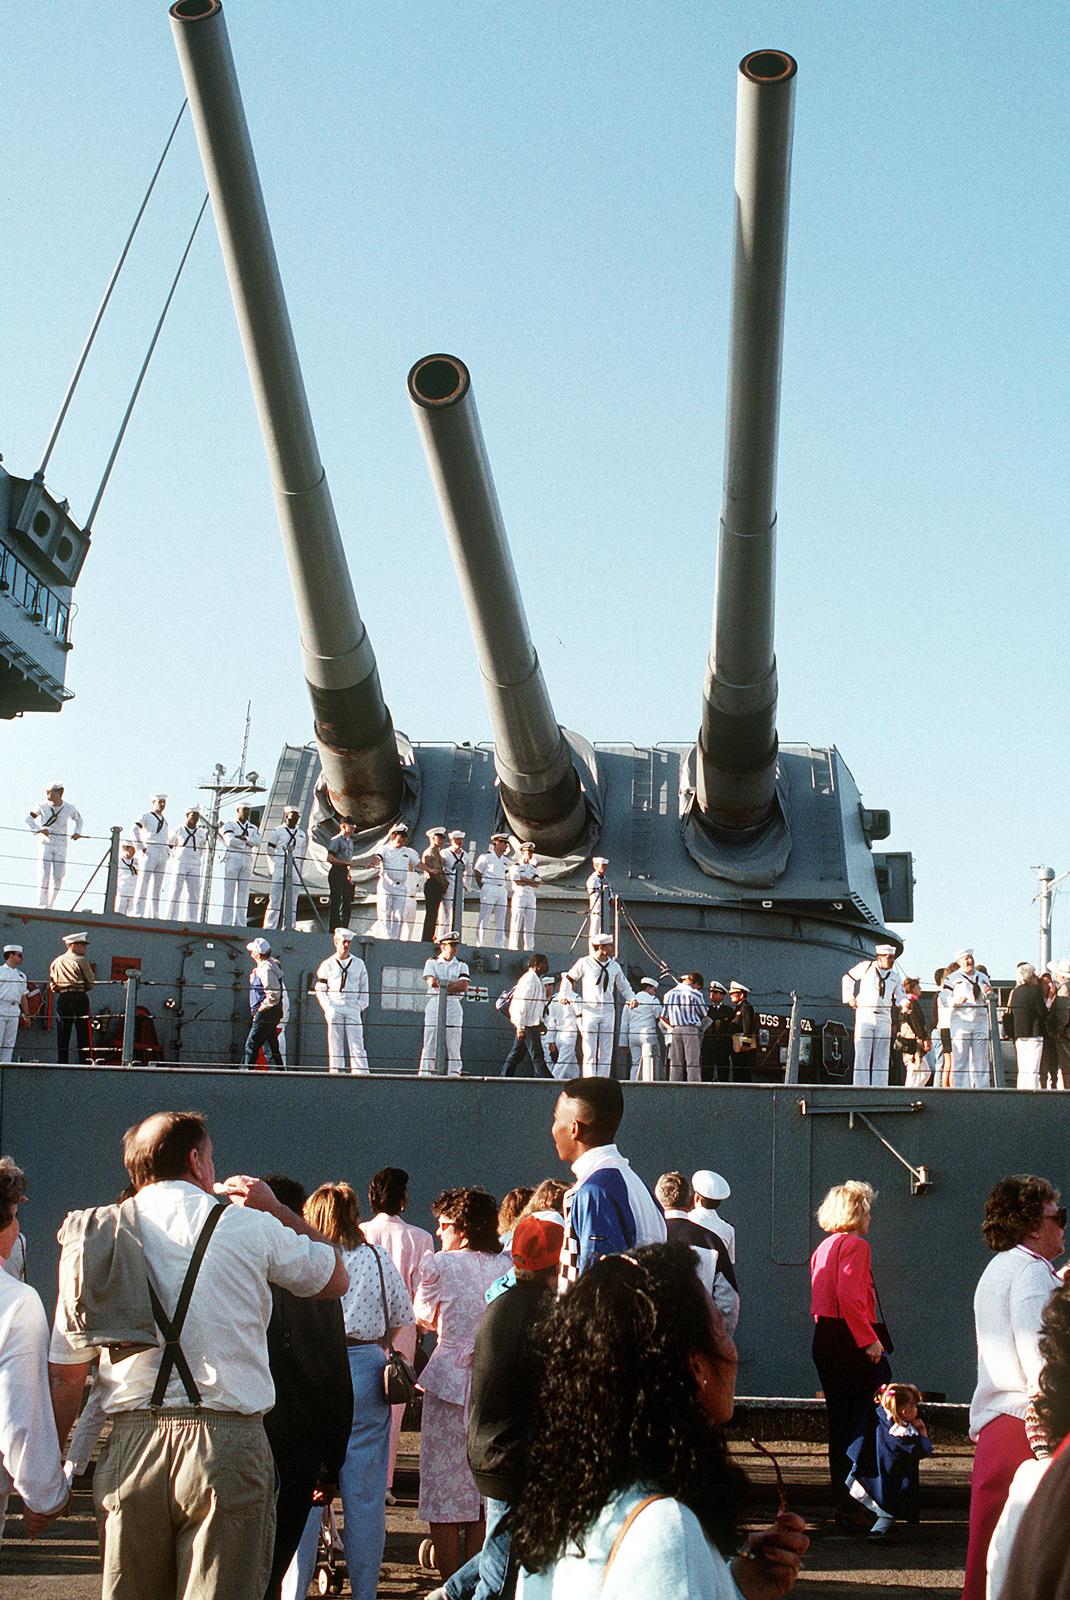 The 16-inch guns aboard the battleship USS IOWA (BB-61) loom over